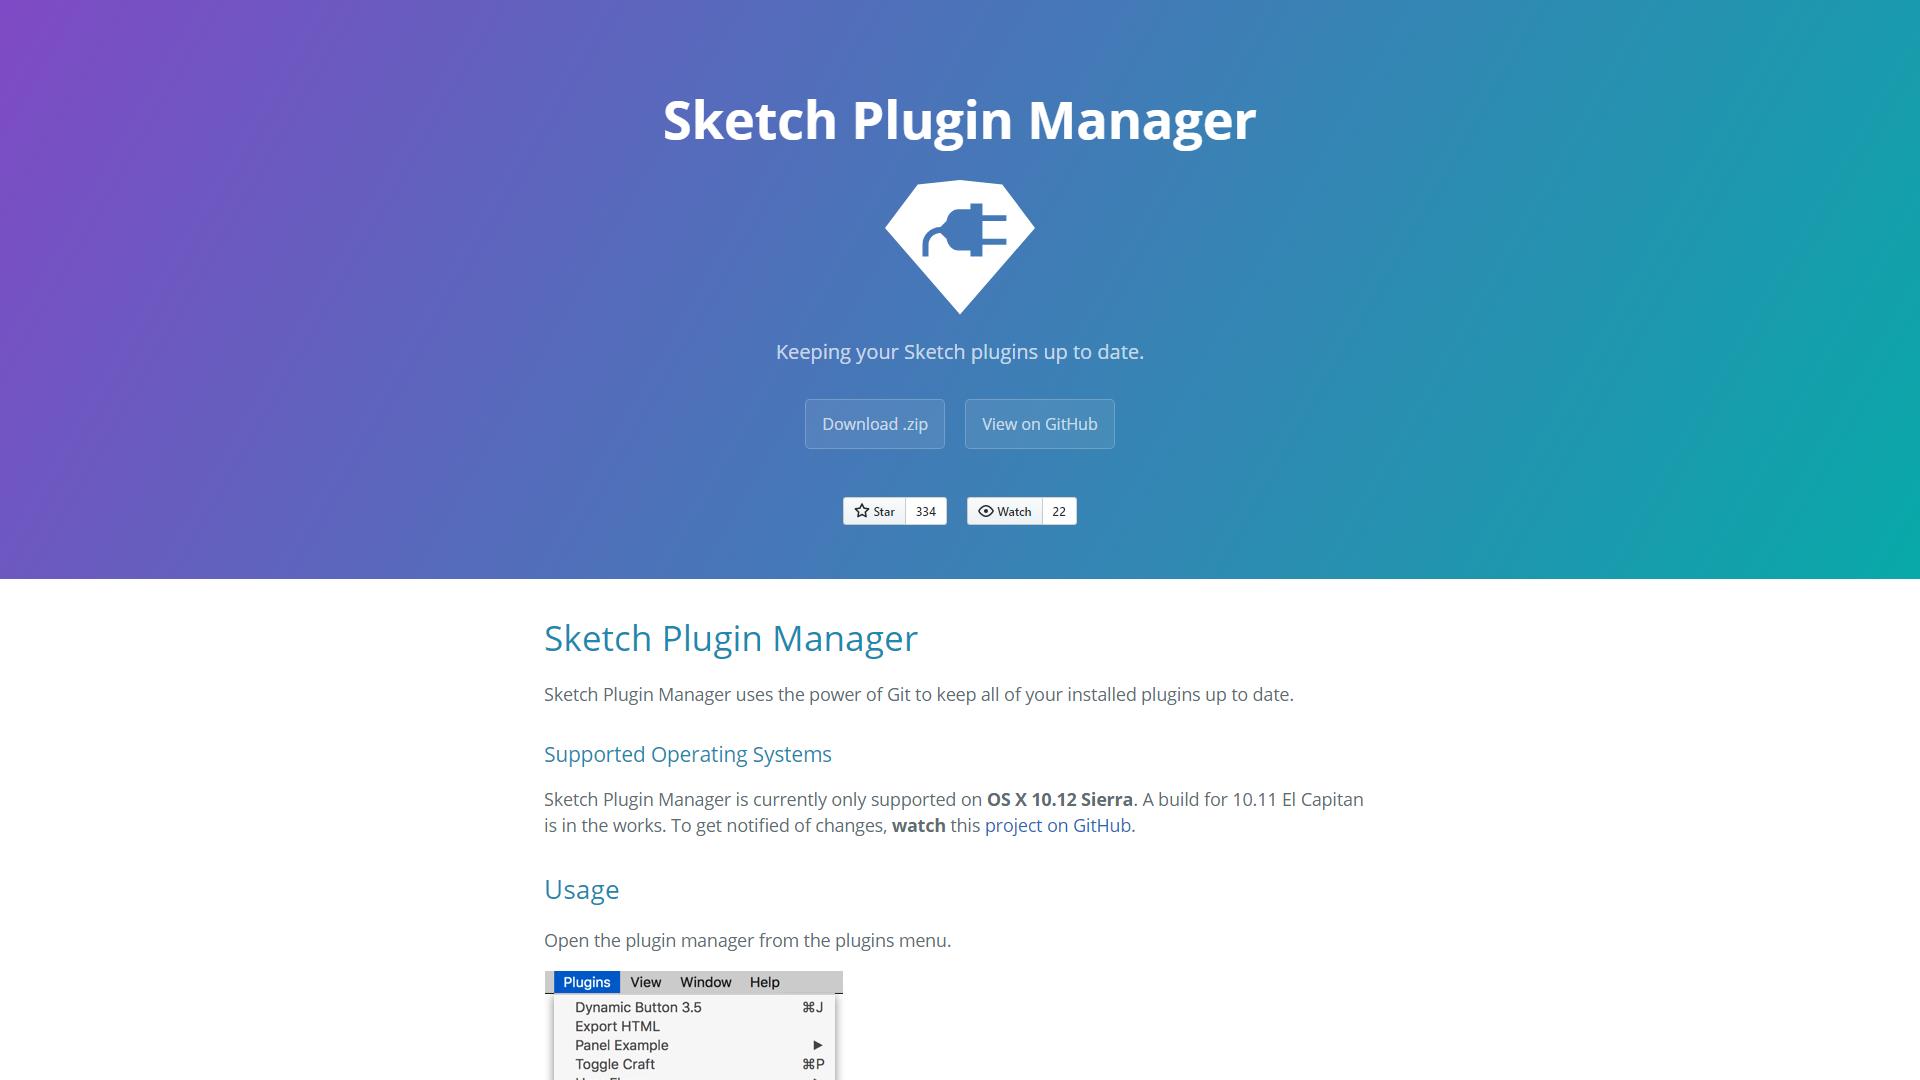 Sketch Plugin Manager